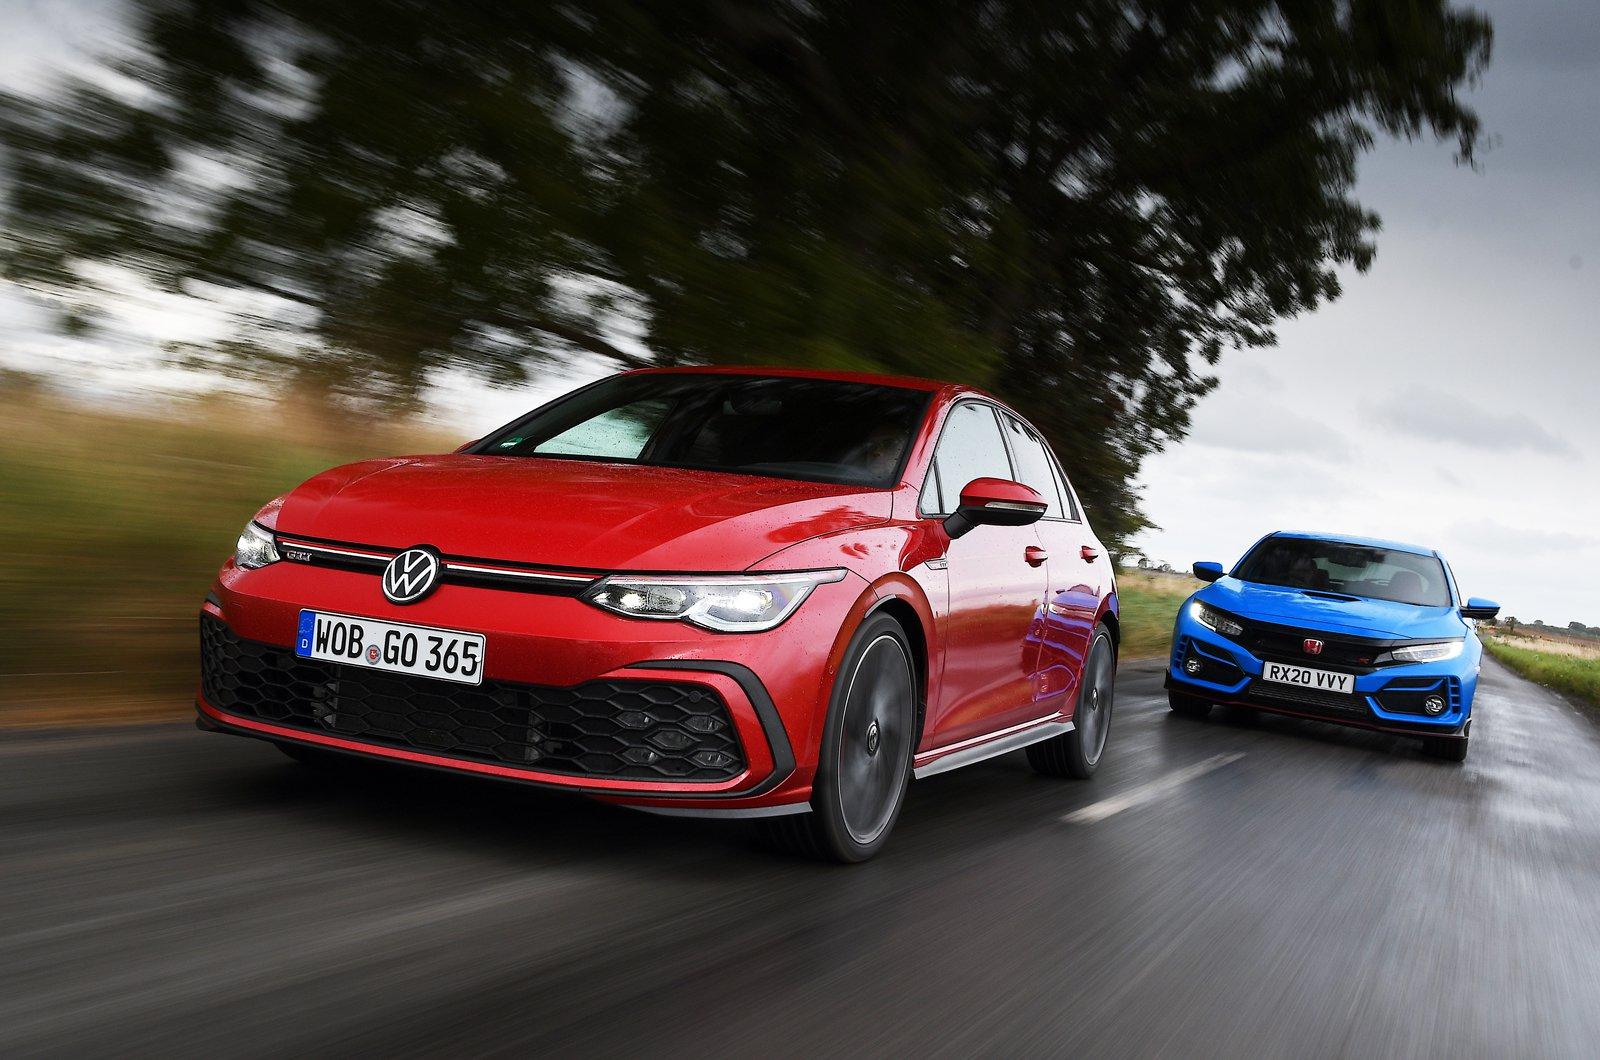 New Volkswagen GTI vs Honda Civic Type R fronts